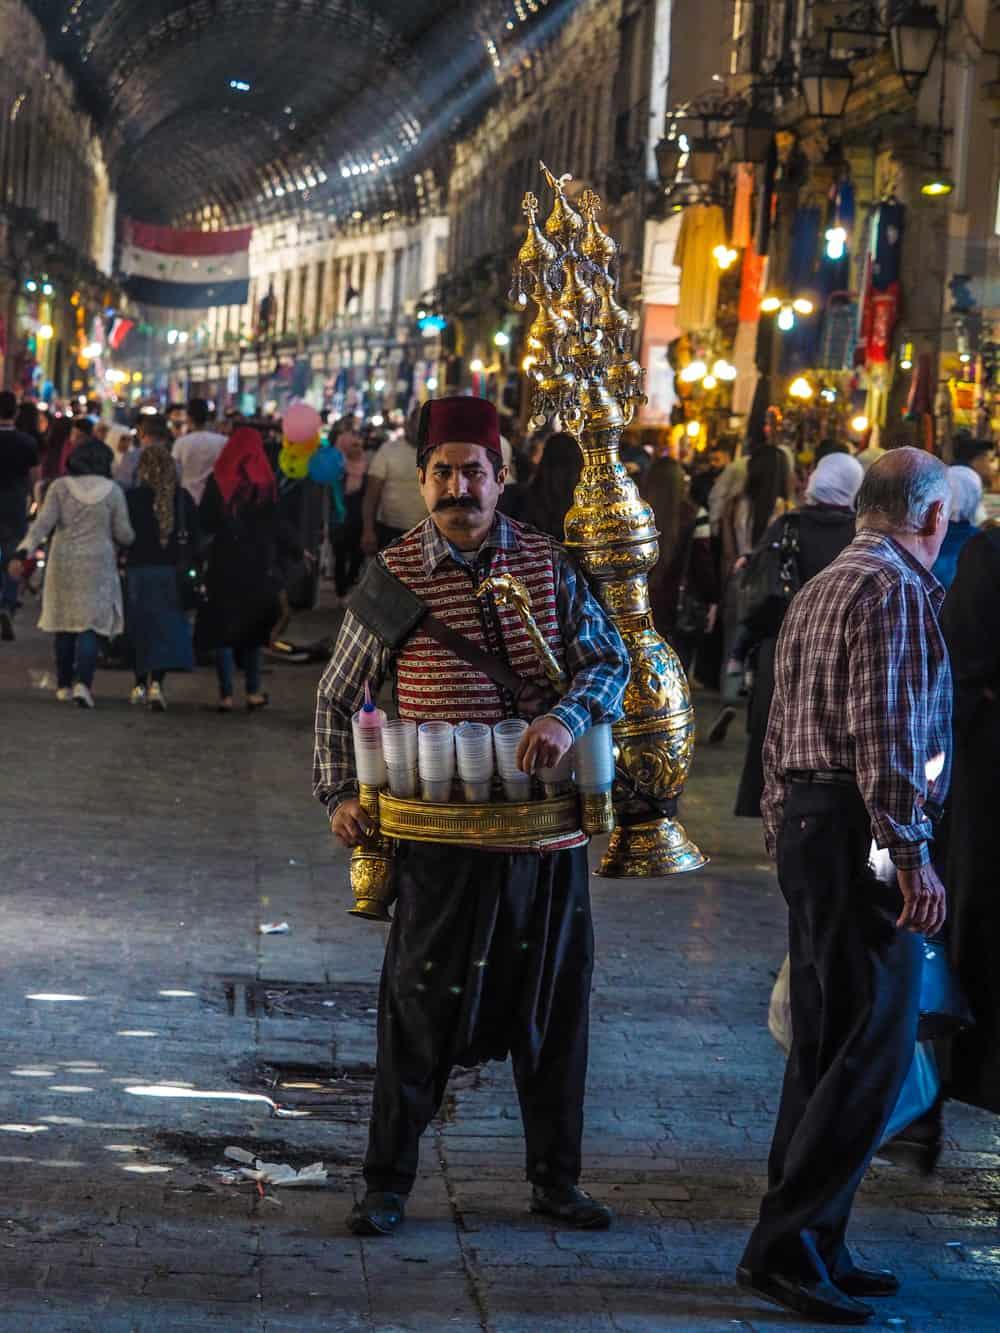 a juice sells men in Damascus bazar